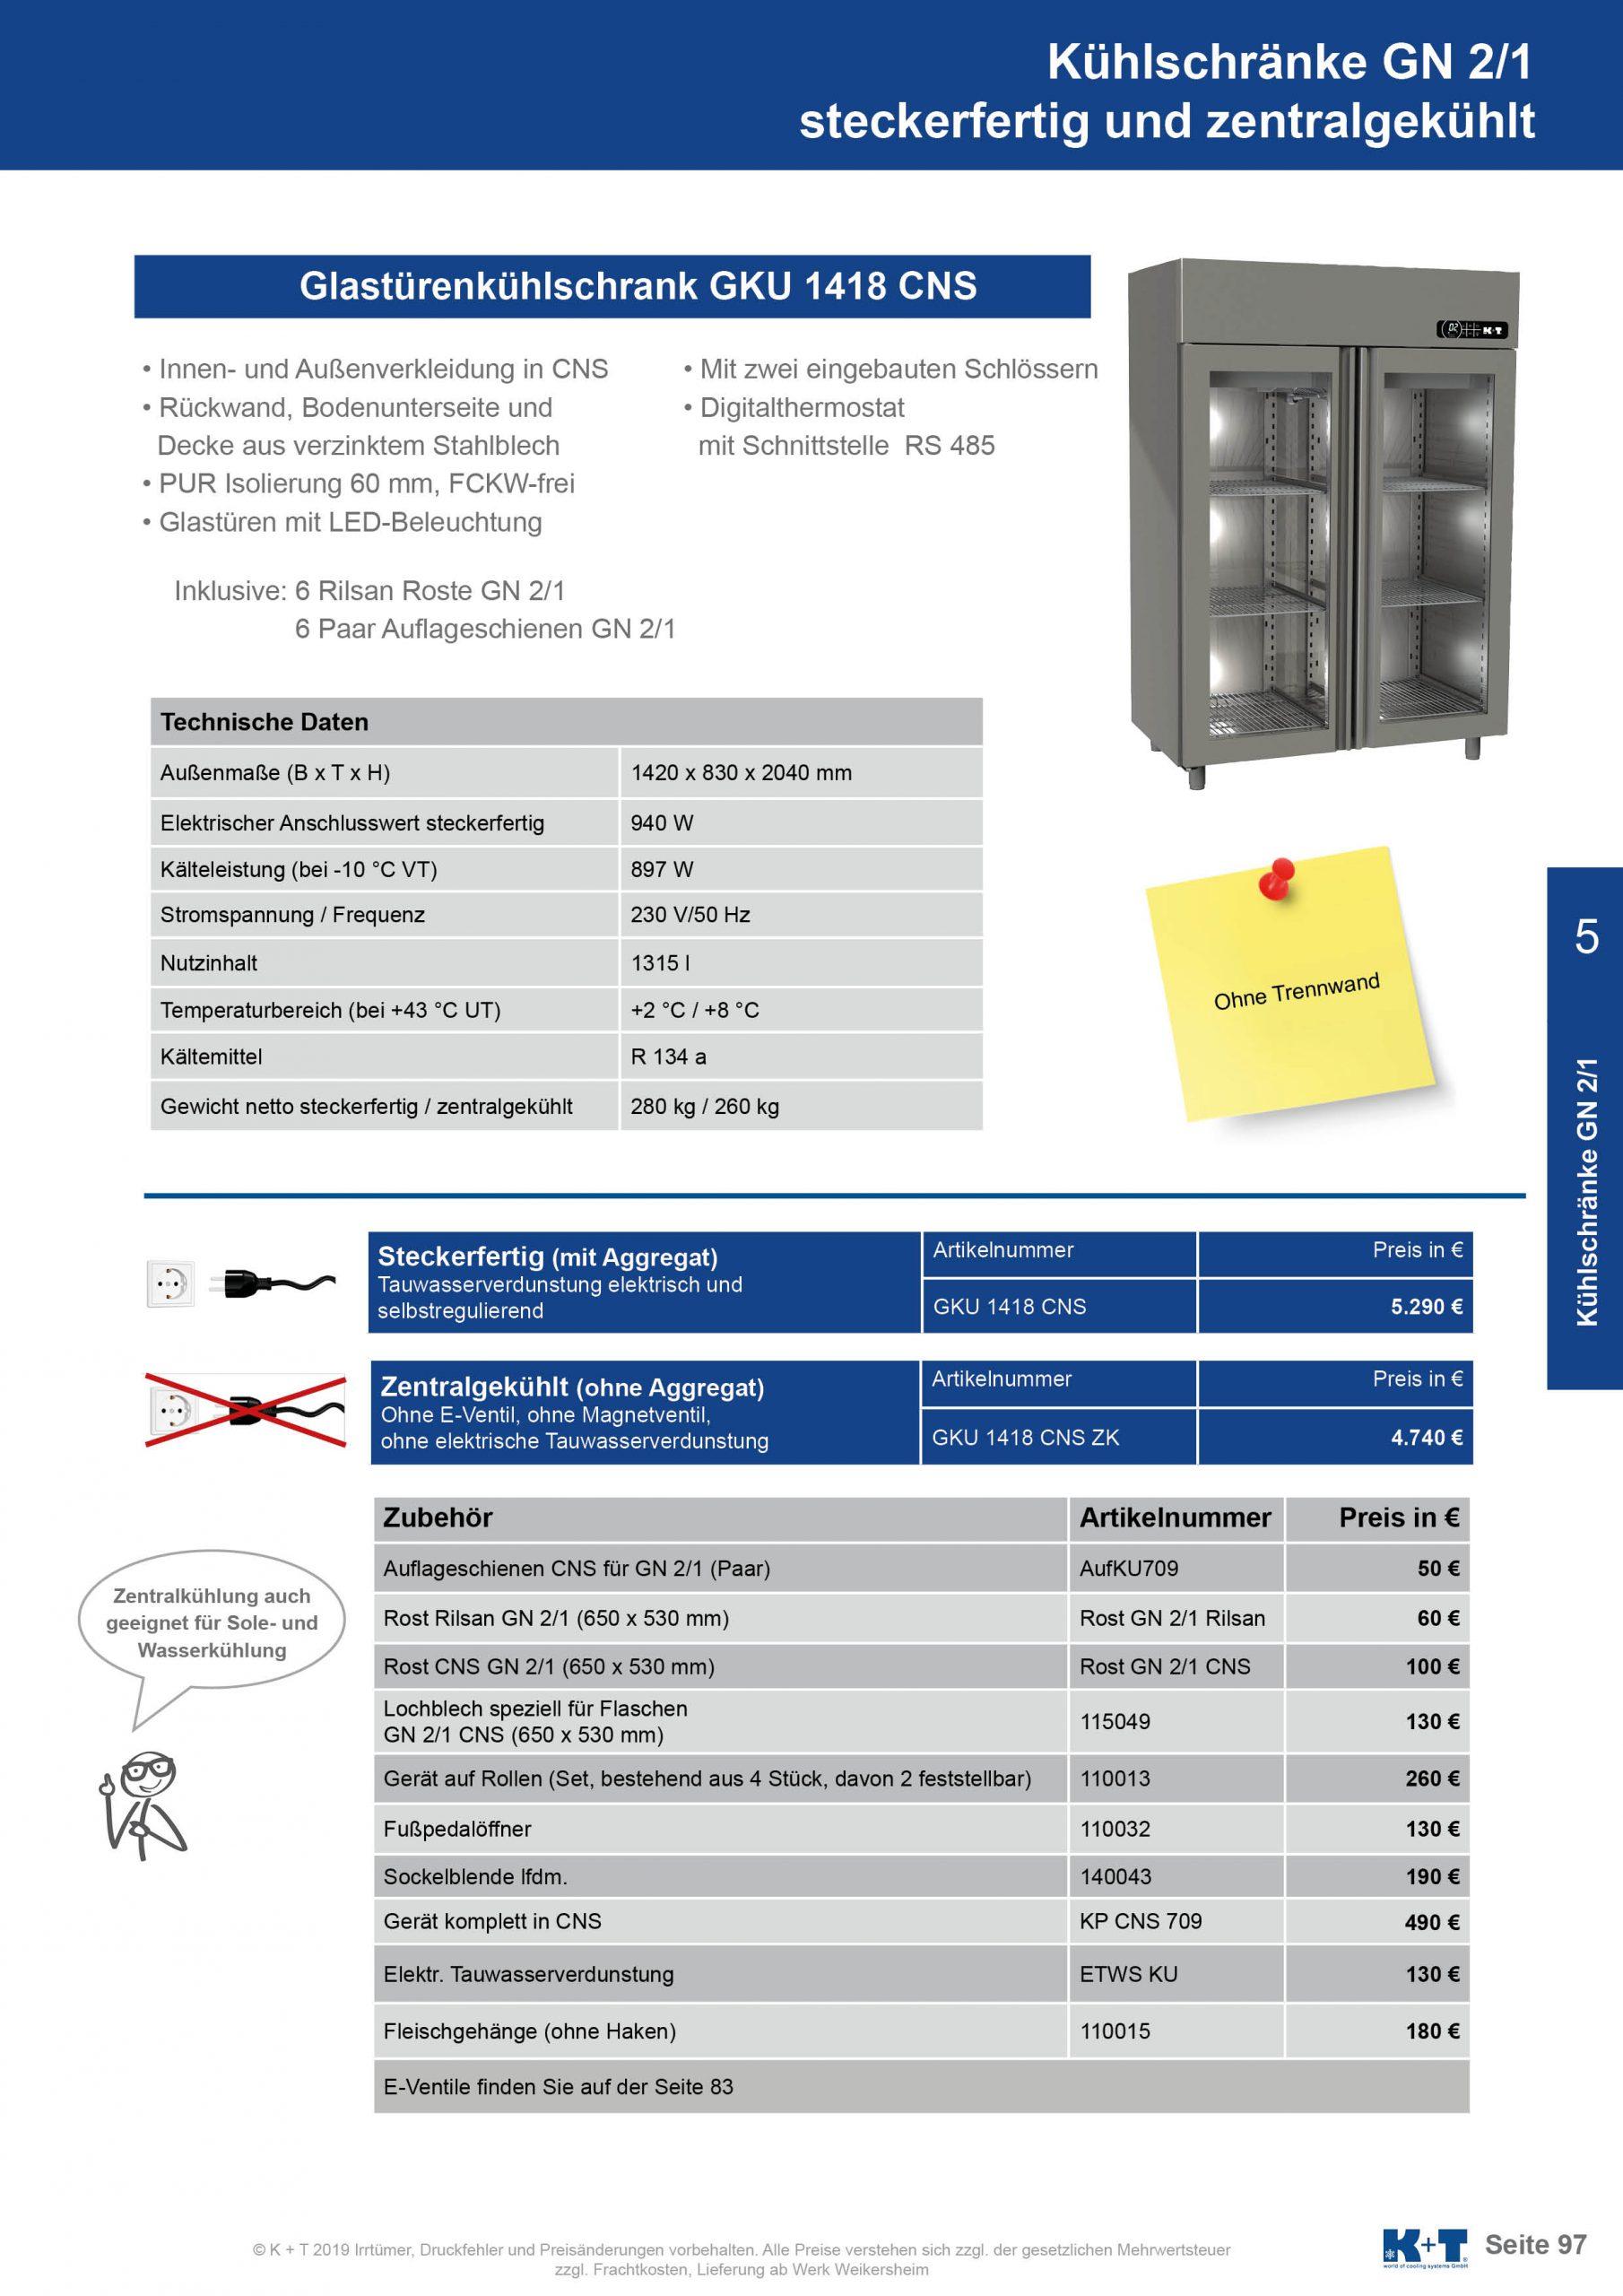 Kühlschränke GN 2_1 Doppelglastürenkühlschrank zentralgekühlt